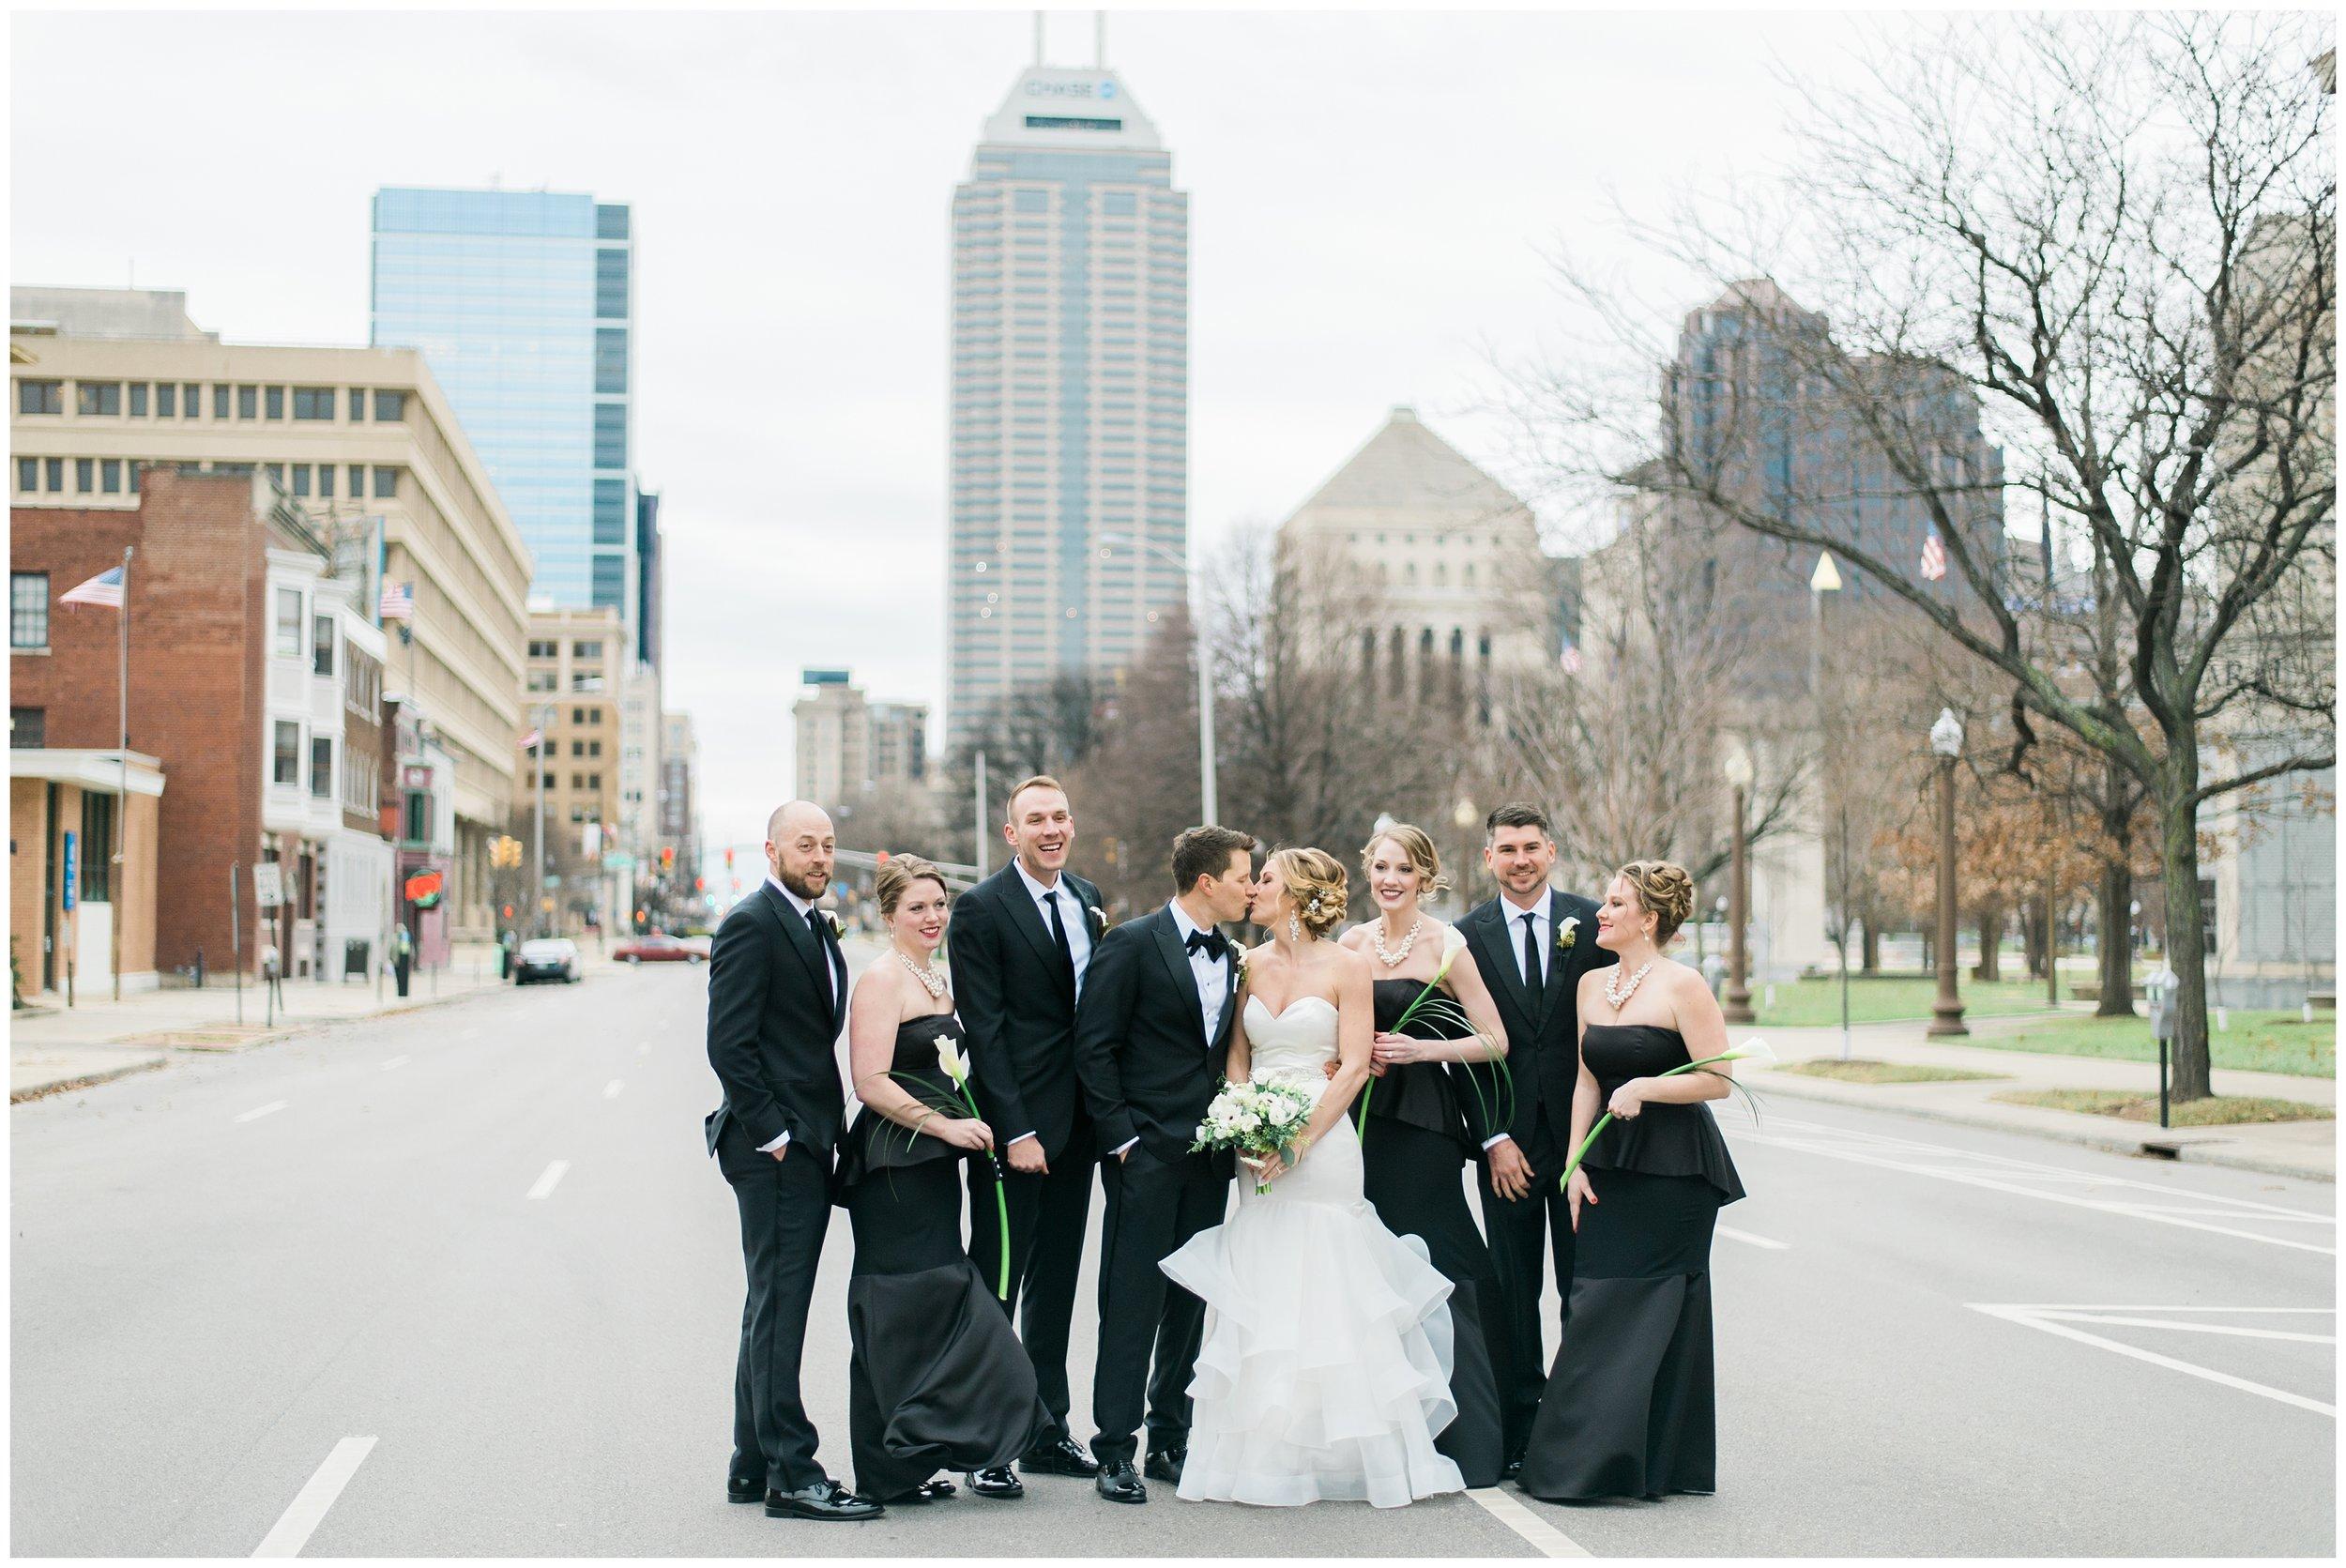 Rebecca_Bridges_Photography_Indianapolis_Wedding_Photographer_5820.jpg